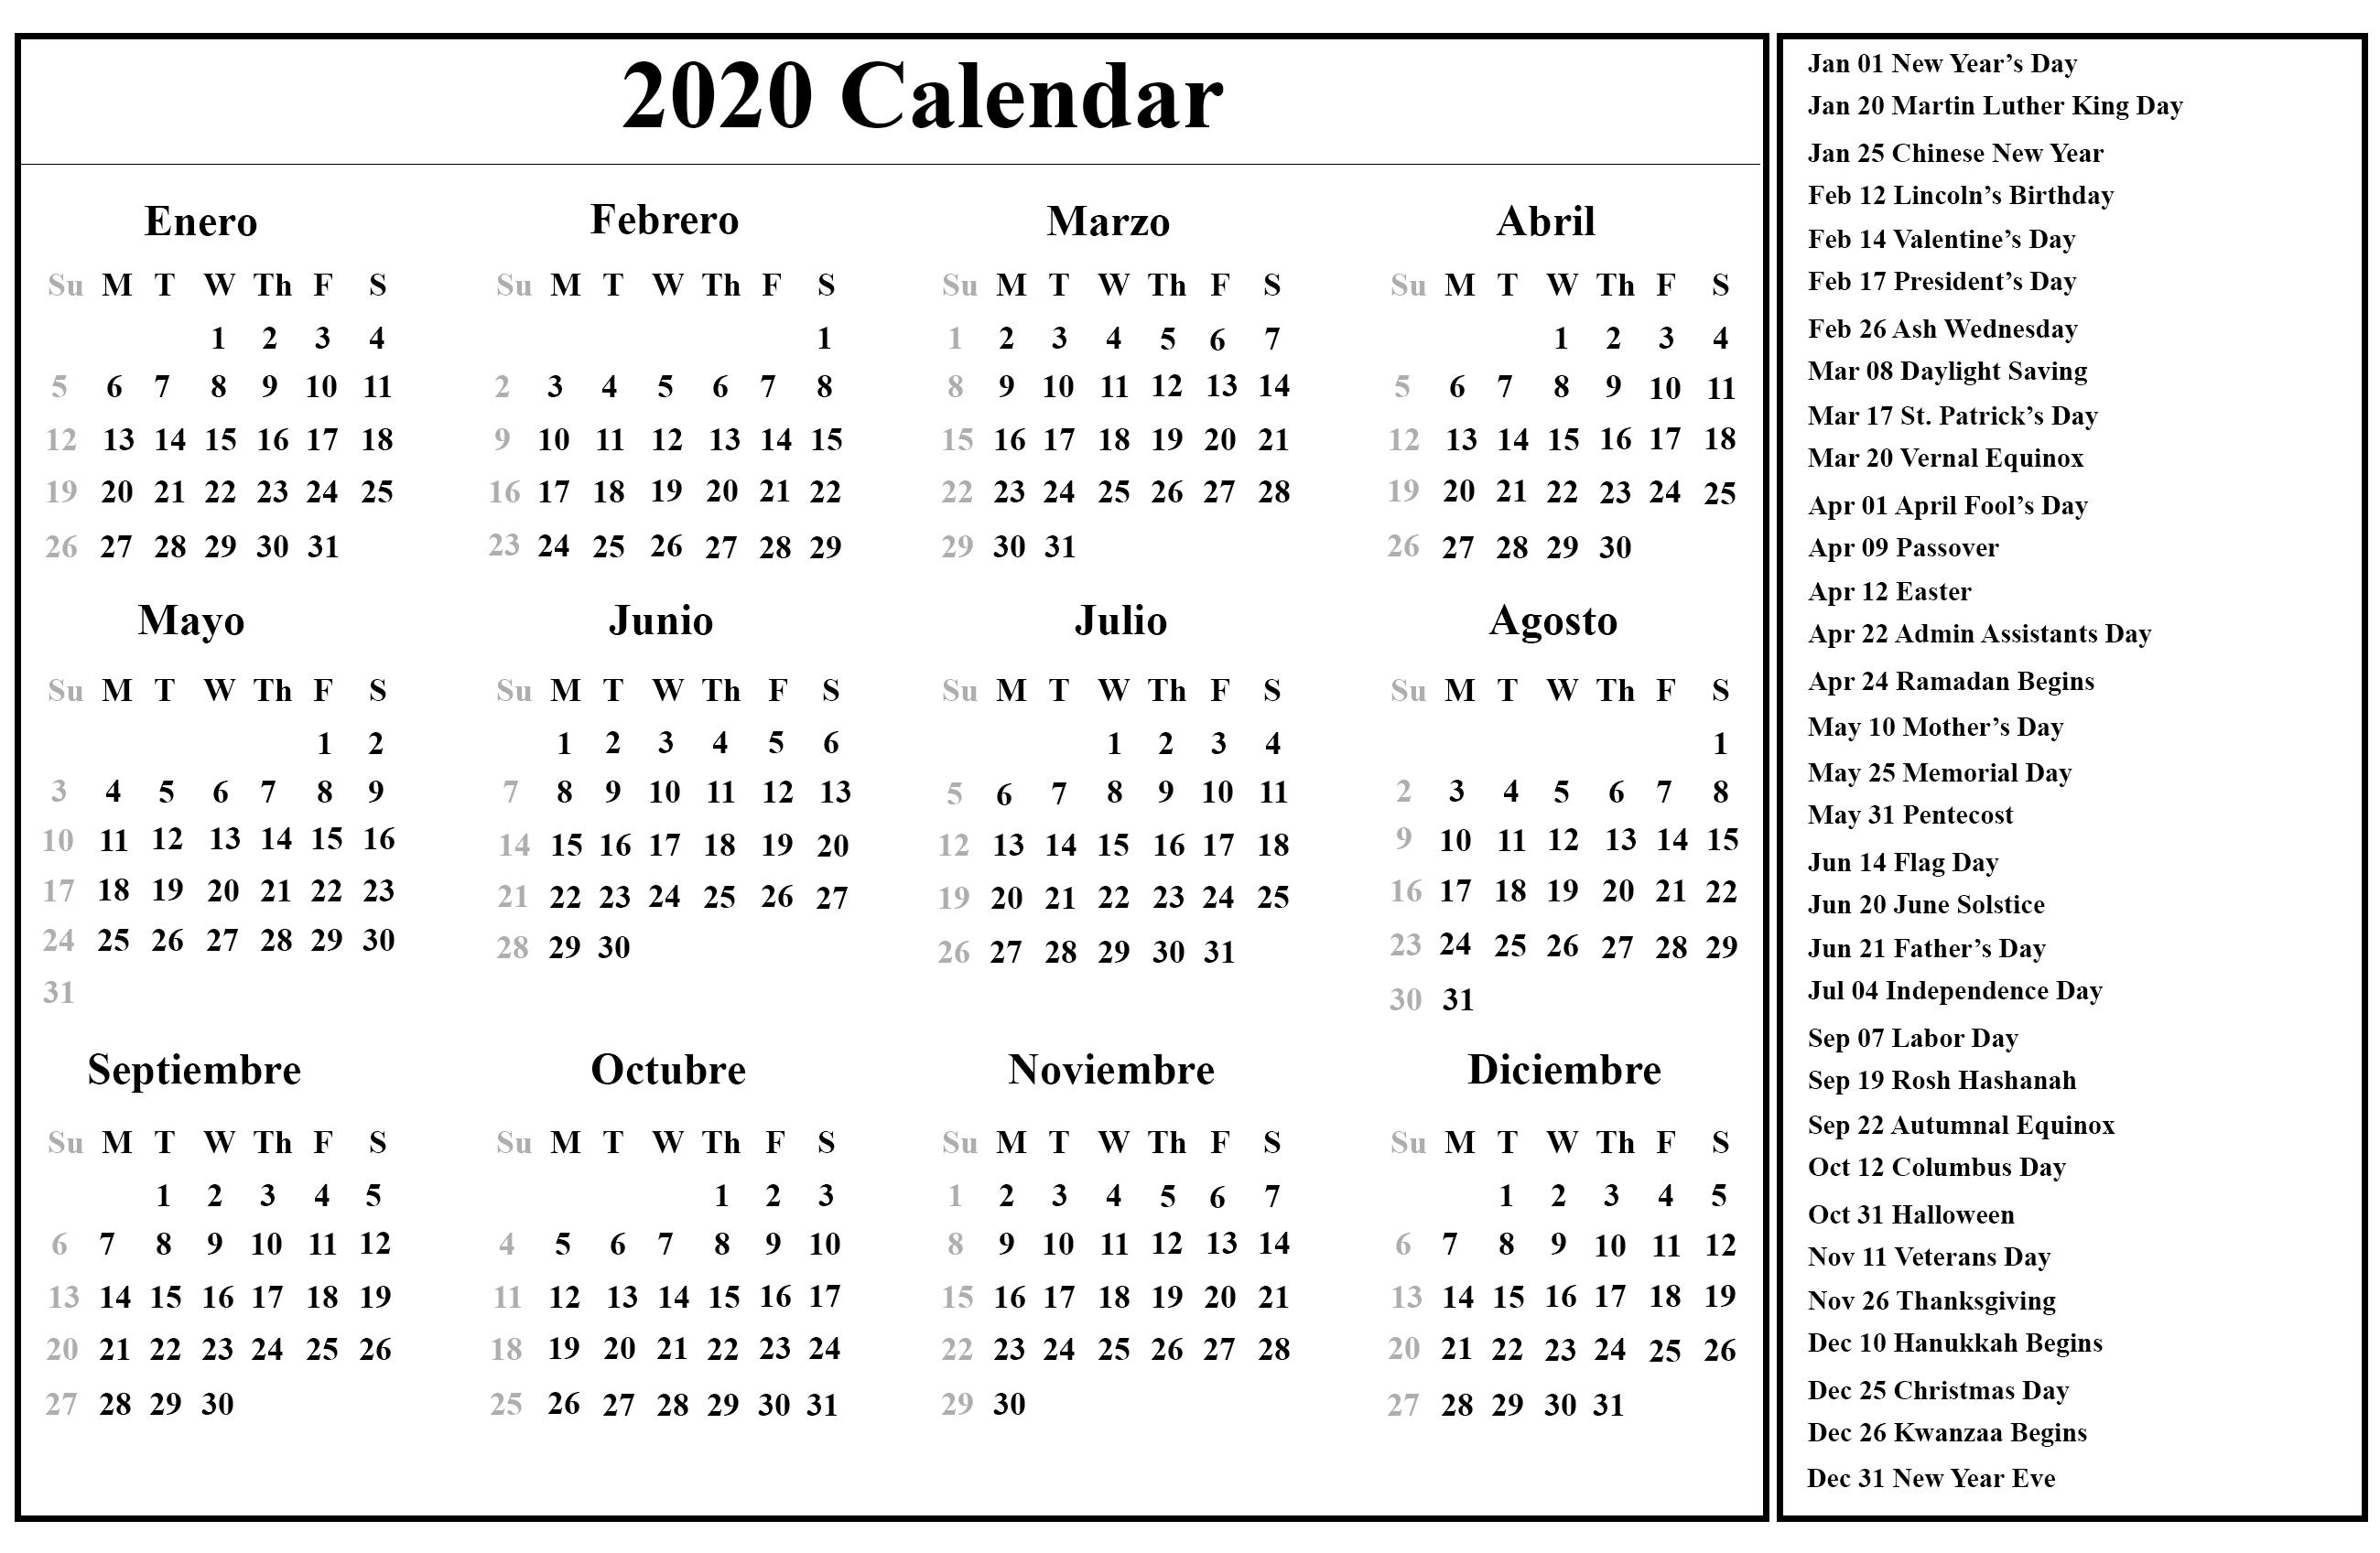 Free Printable Spanish Calendar 2020 | 2020 Calendario-2020 Calendar With Holidays In India Pdf